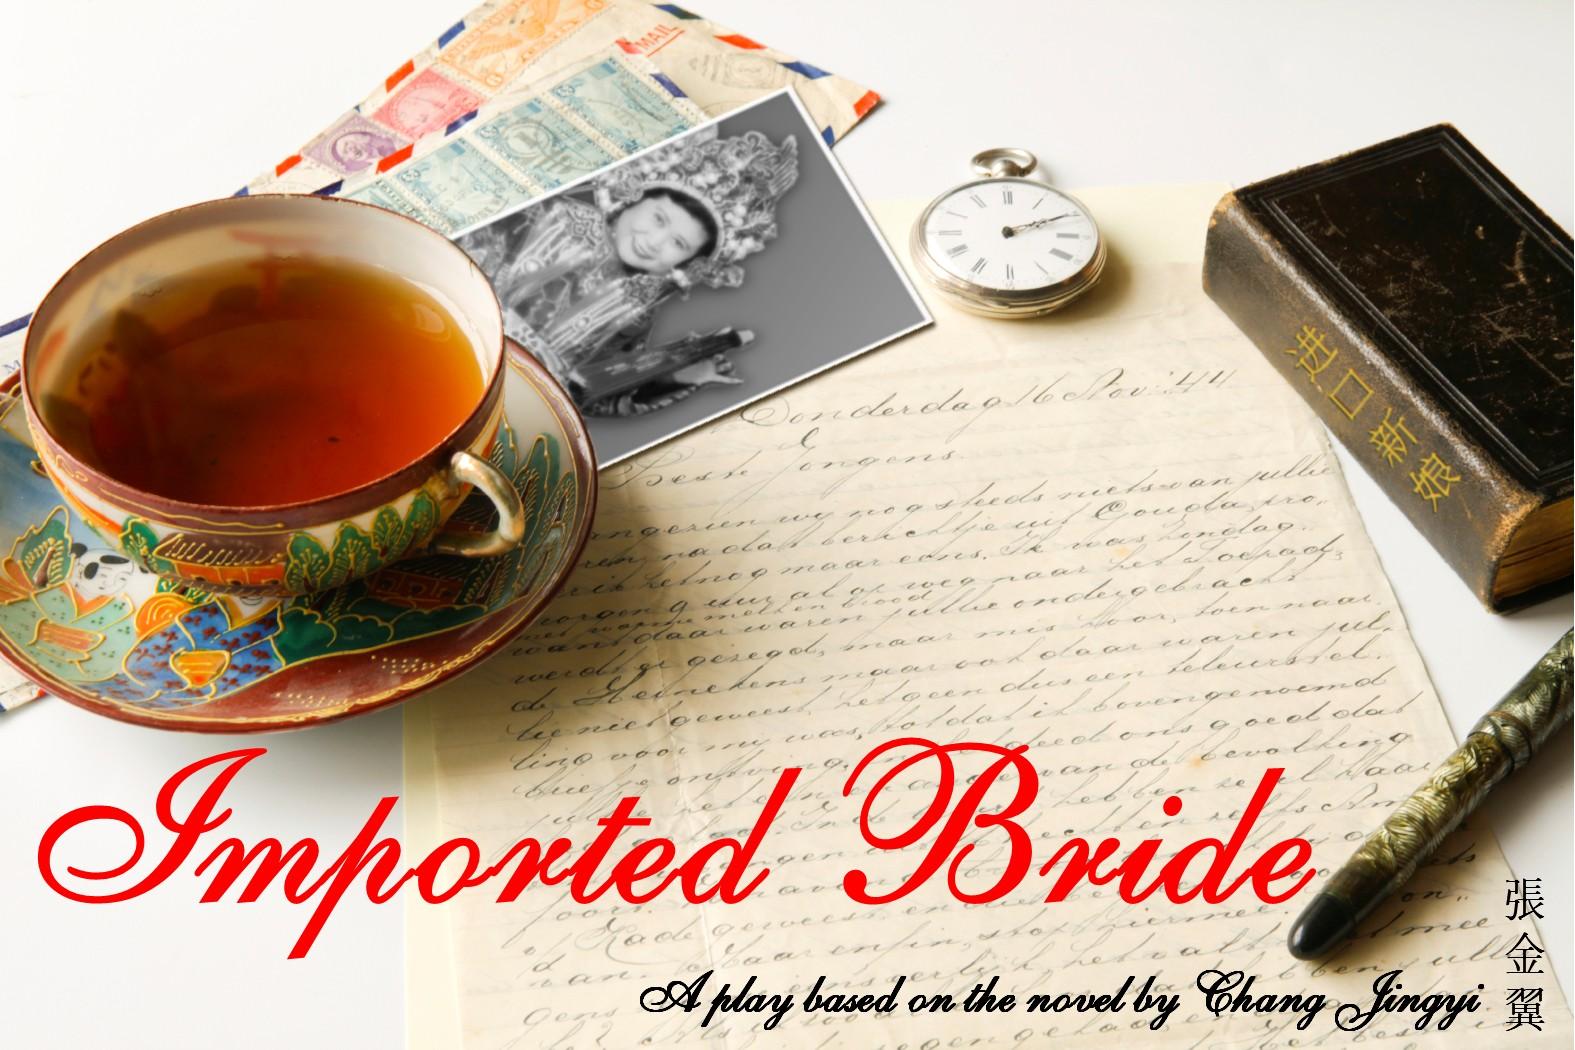 Imported Bride Torrance Cultural Arts Foundation